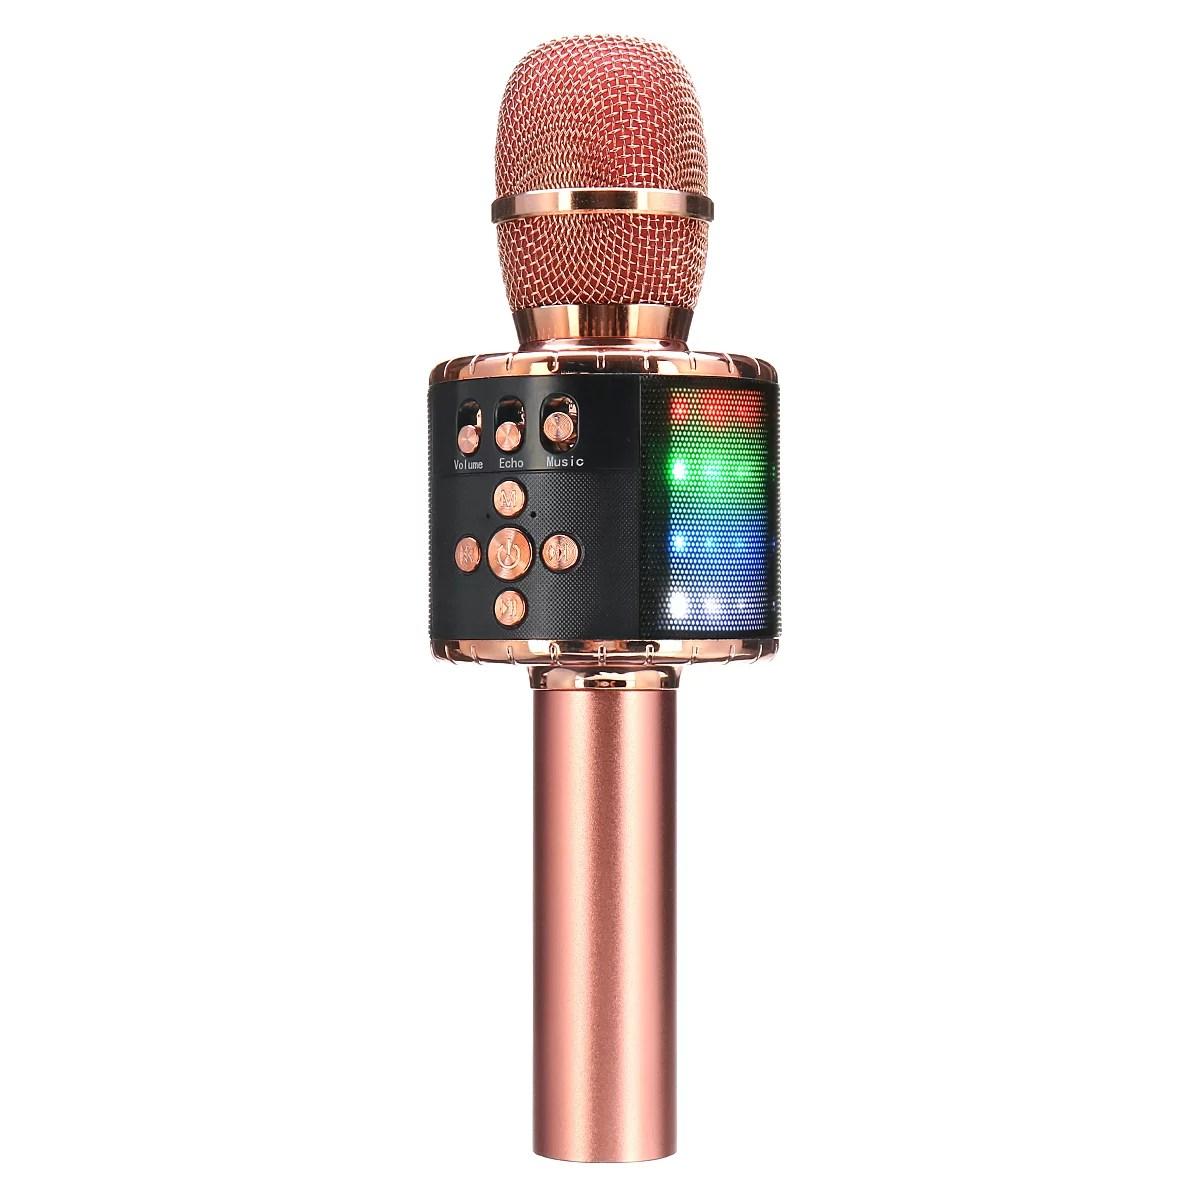 karaoke Microphone,4 In 1 Wireless LED h Karaoke Microphone with Light ,Mini USB Speaker for Home KTV - Walmart.com